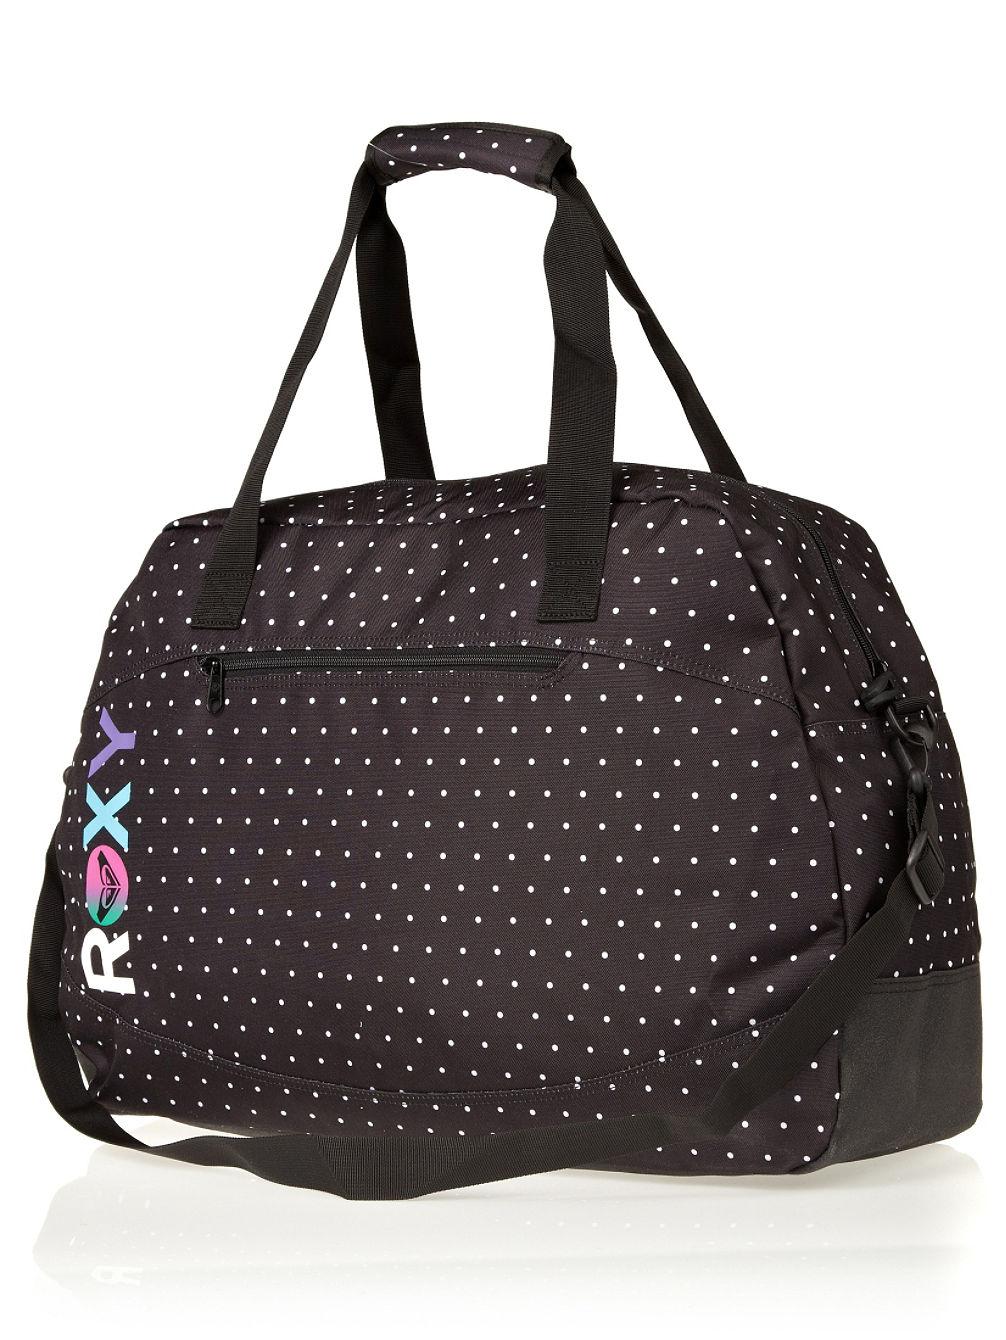 b29b60cd76 Buy Roxy Too Far Travelbag Women online at blue-tomato.com